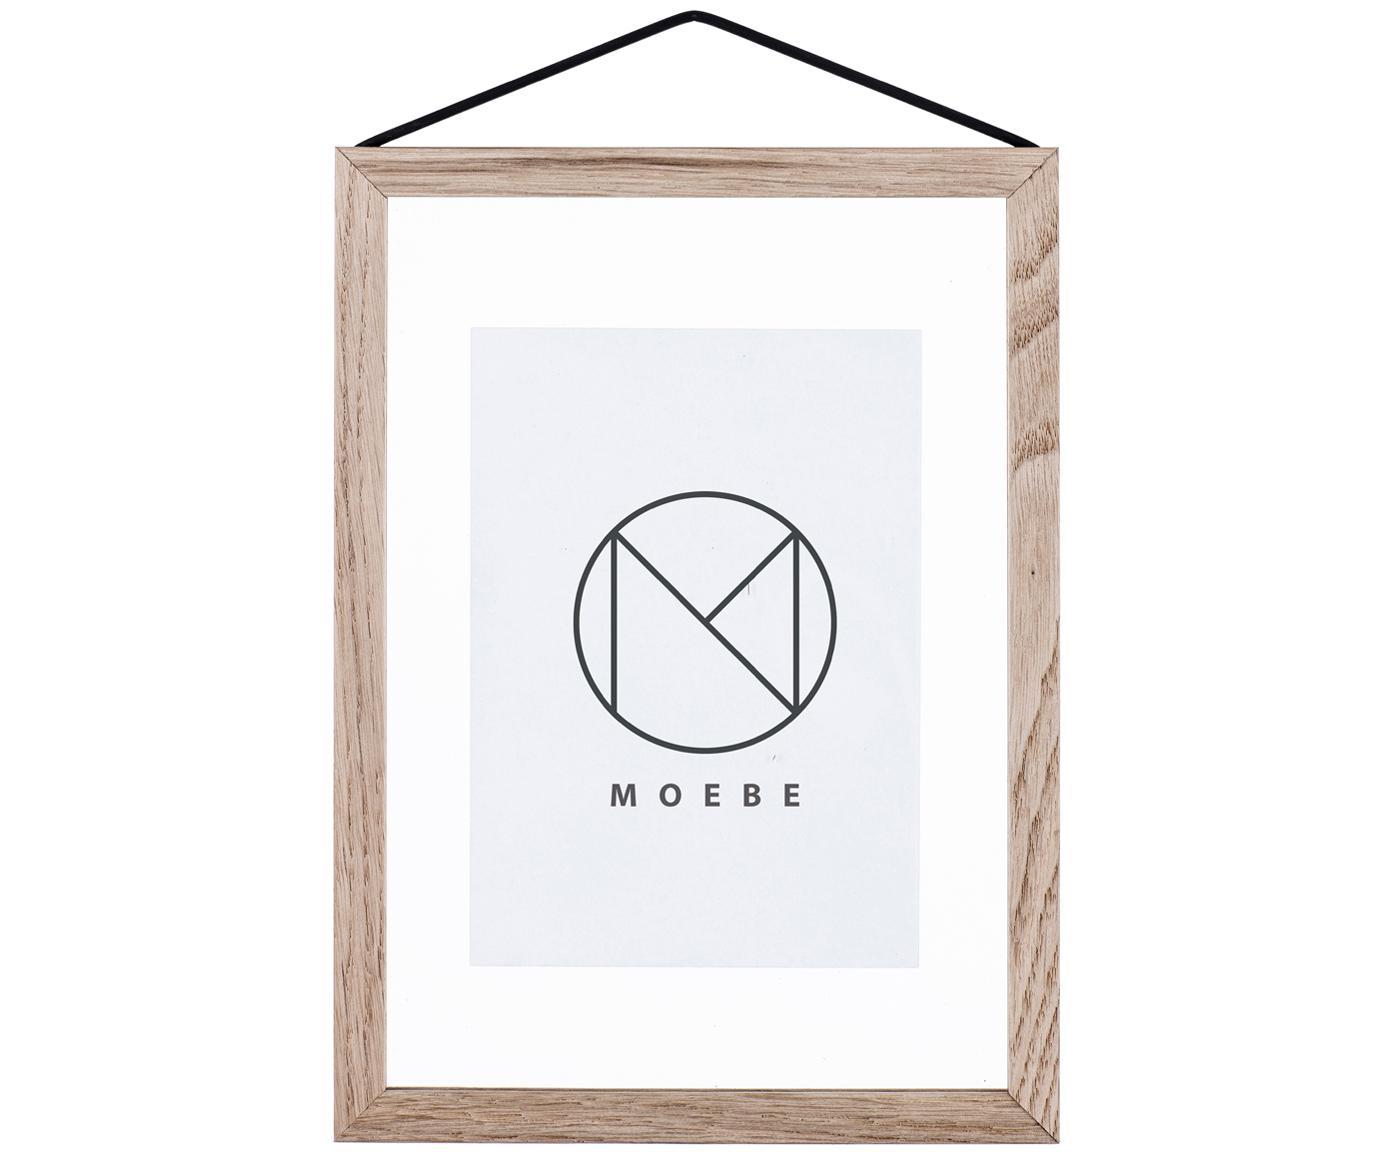 Marco Frame, Marco: roble Suspension: negro Cristal y parte trasera: transparente, An 17 x Al 23 cm